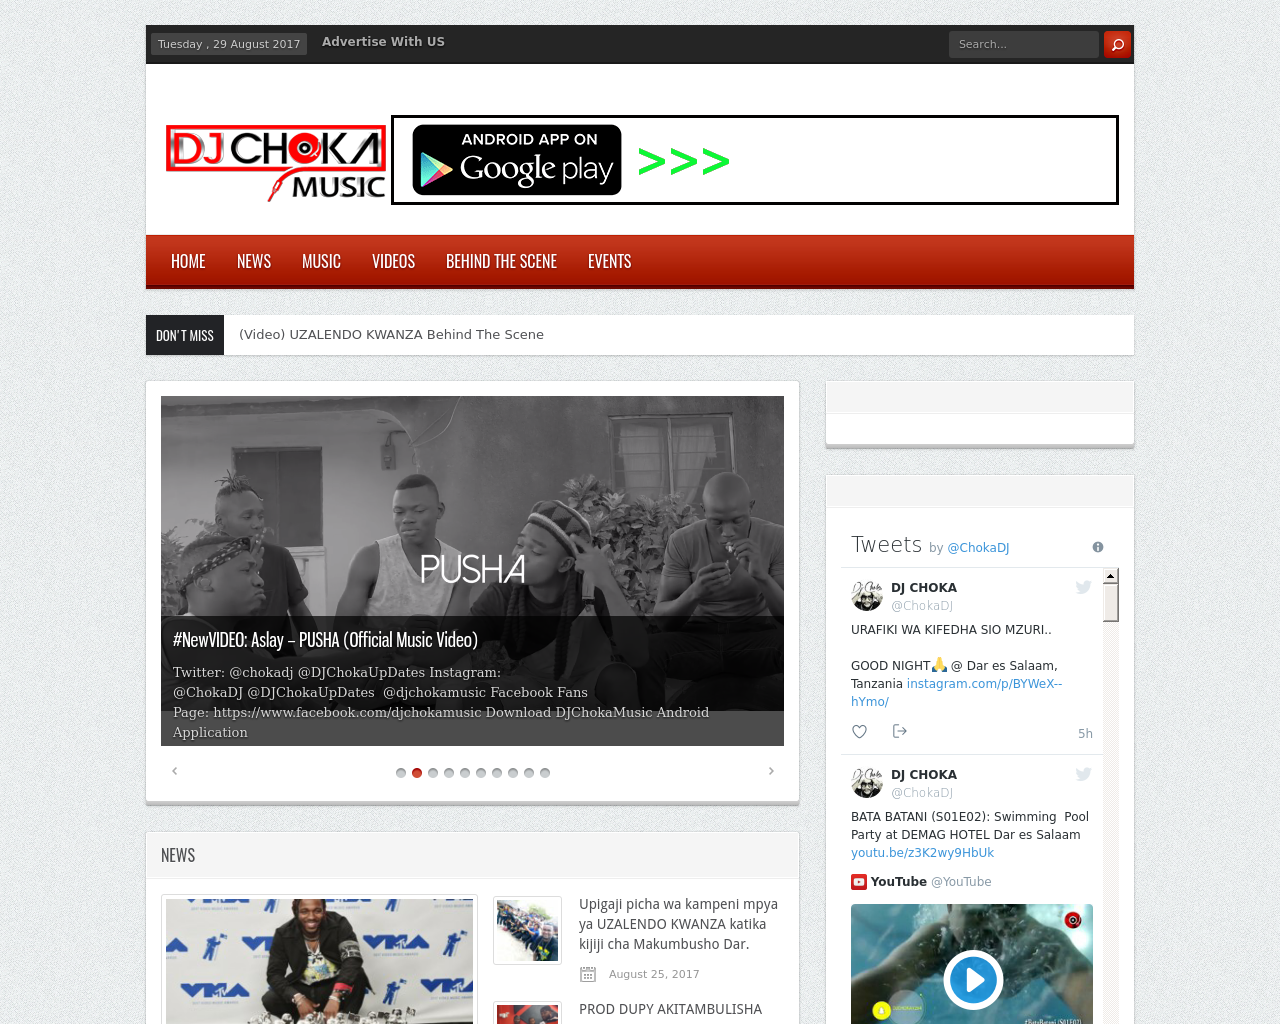 DJChoka-Music-Advertising-Reviews-Pricing